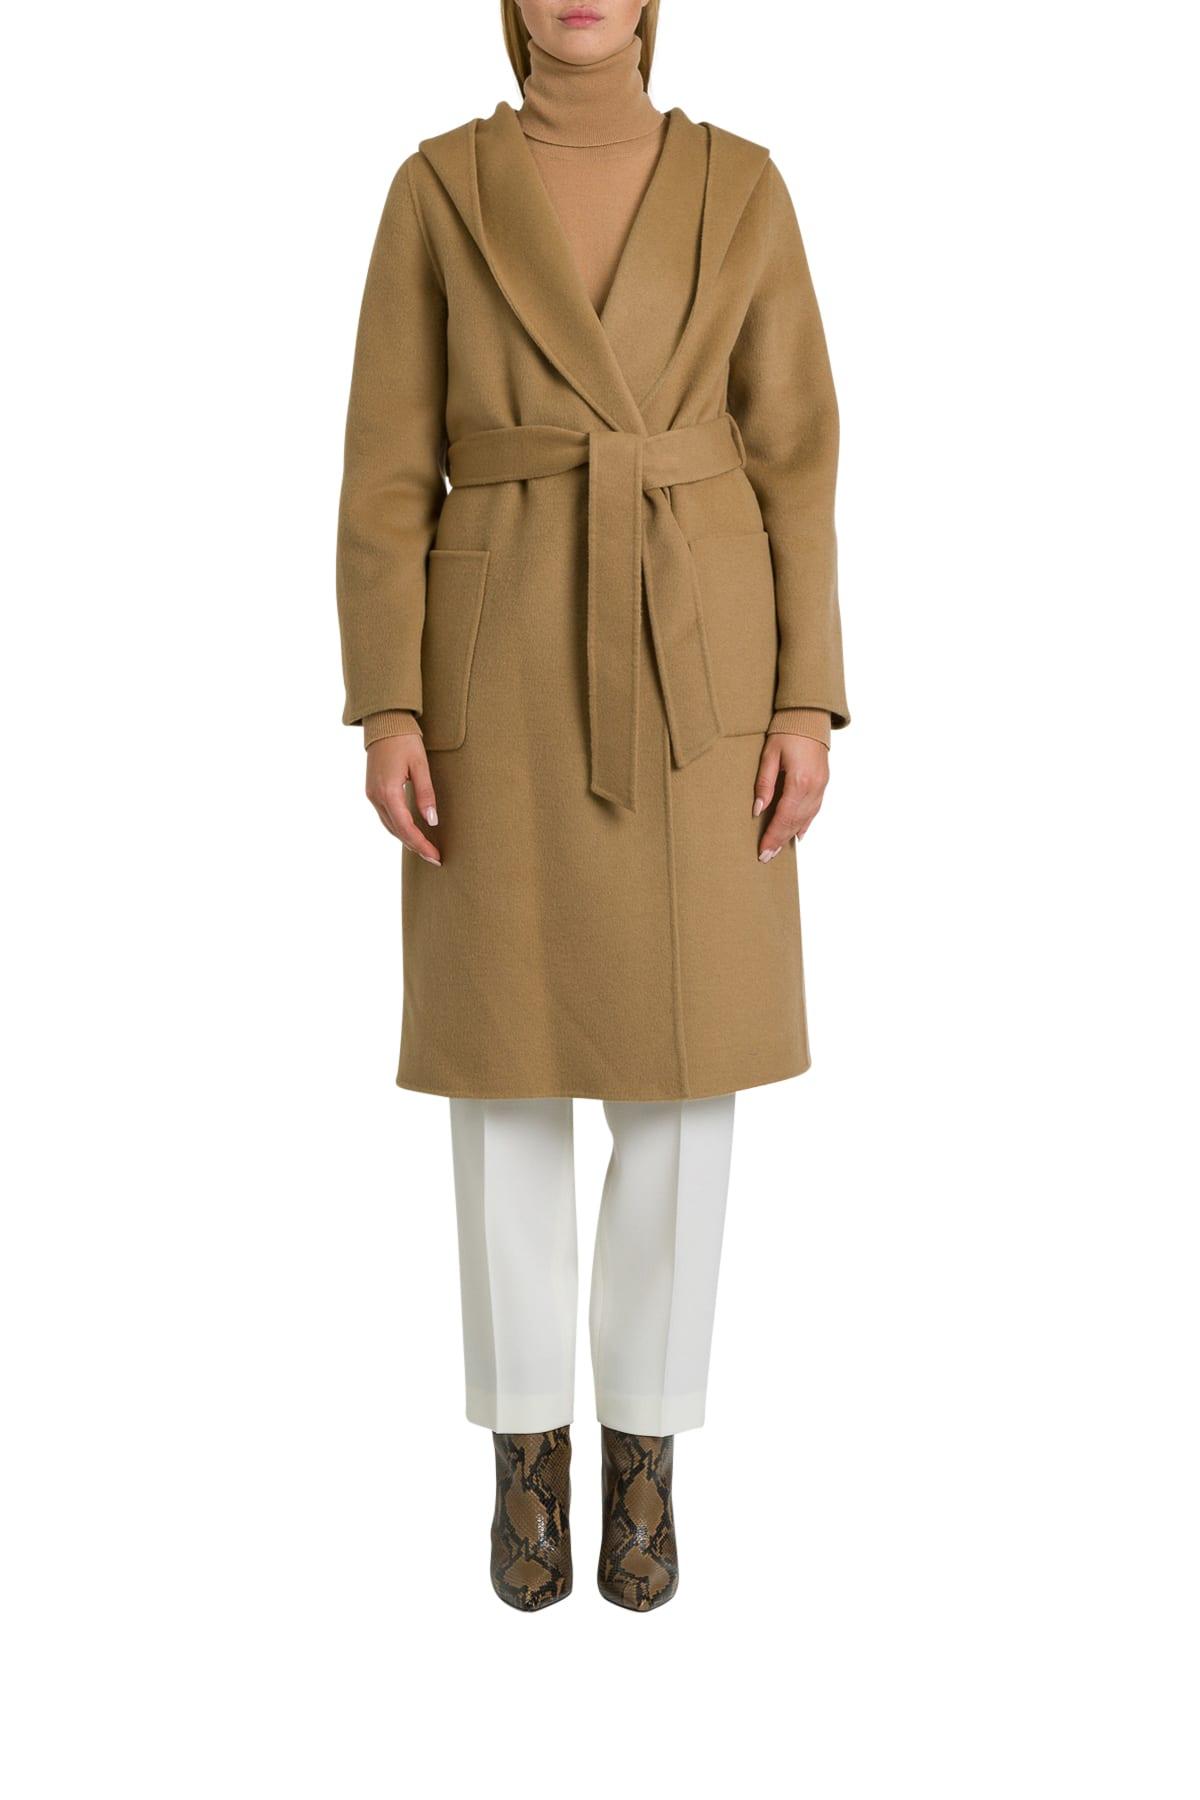 Parosh Lex Hooded Coat With Belt